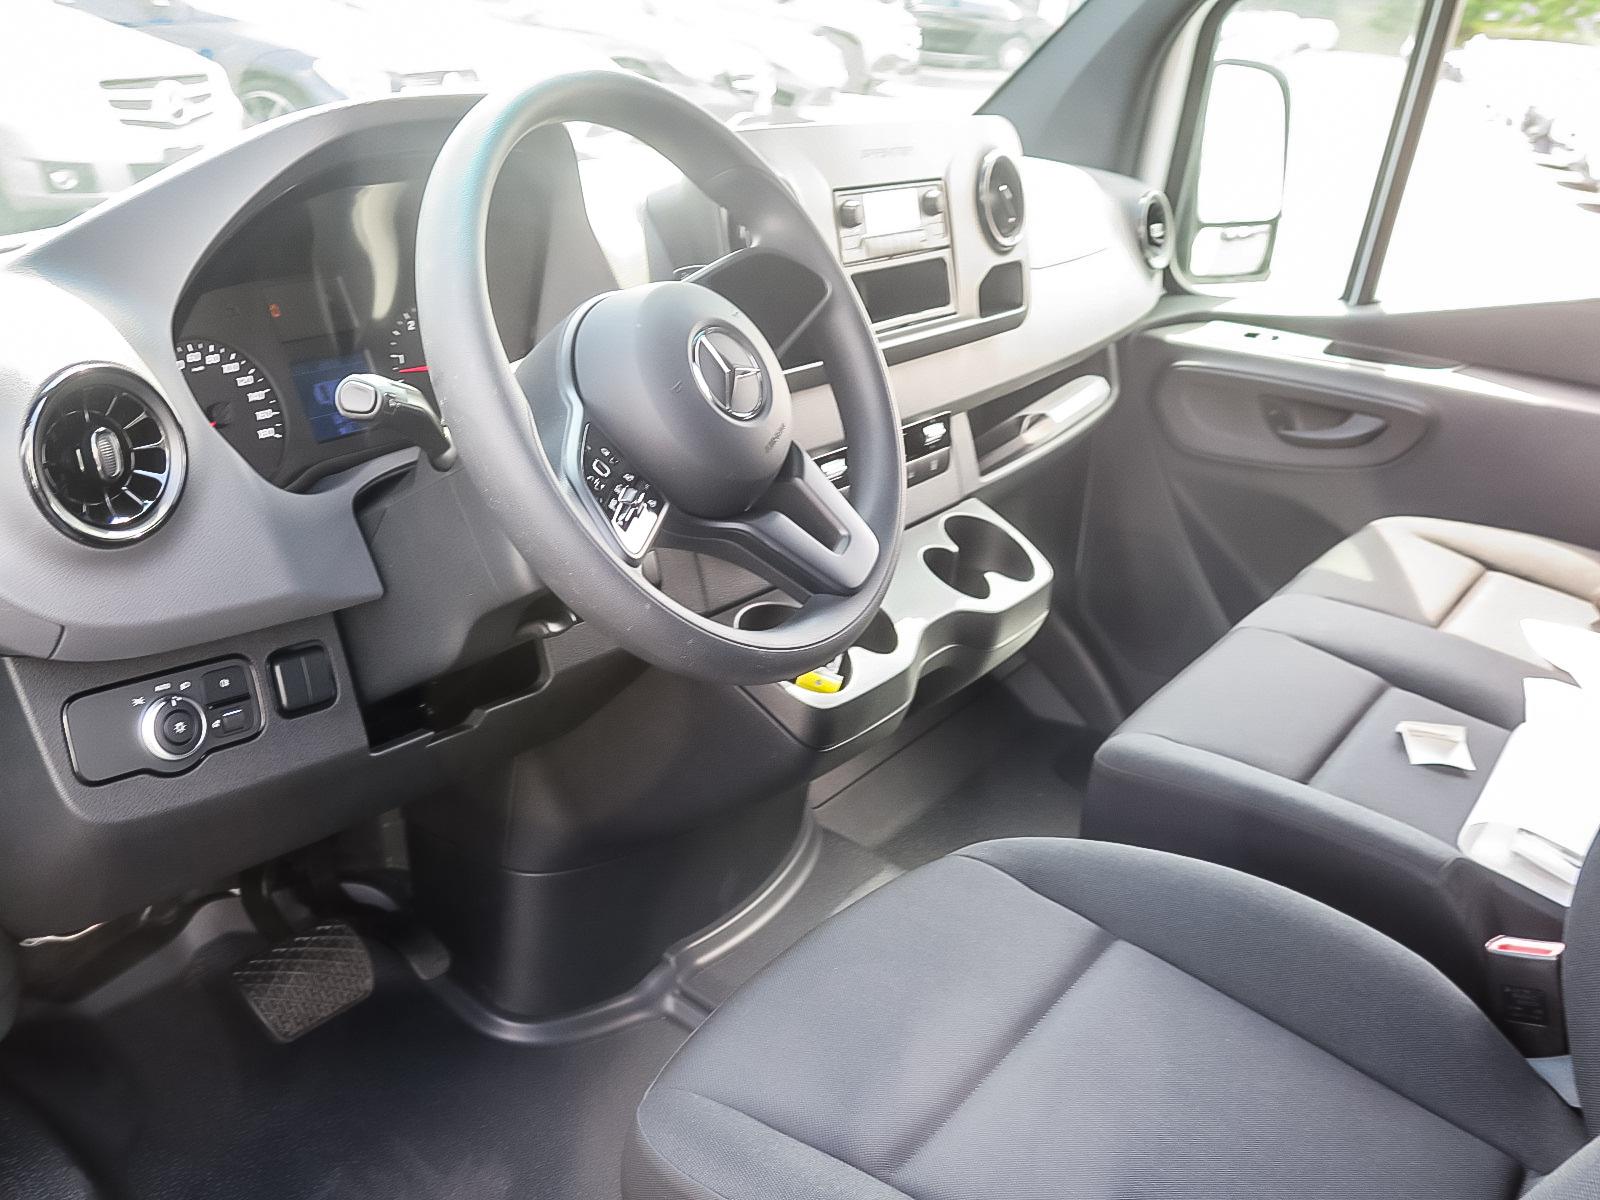 New 2019 Mercedes-Benz Sprinter V6 3500 Cargo 170 Ext.